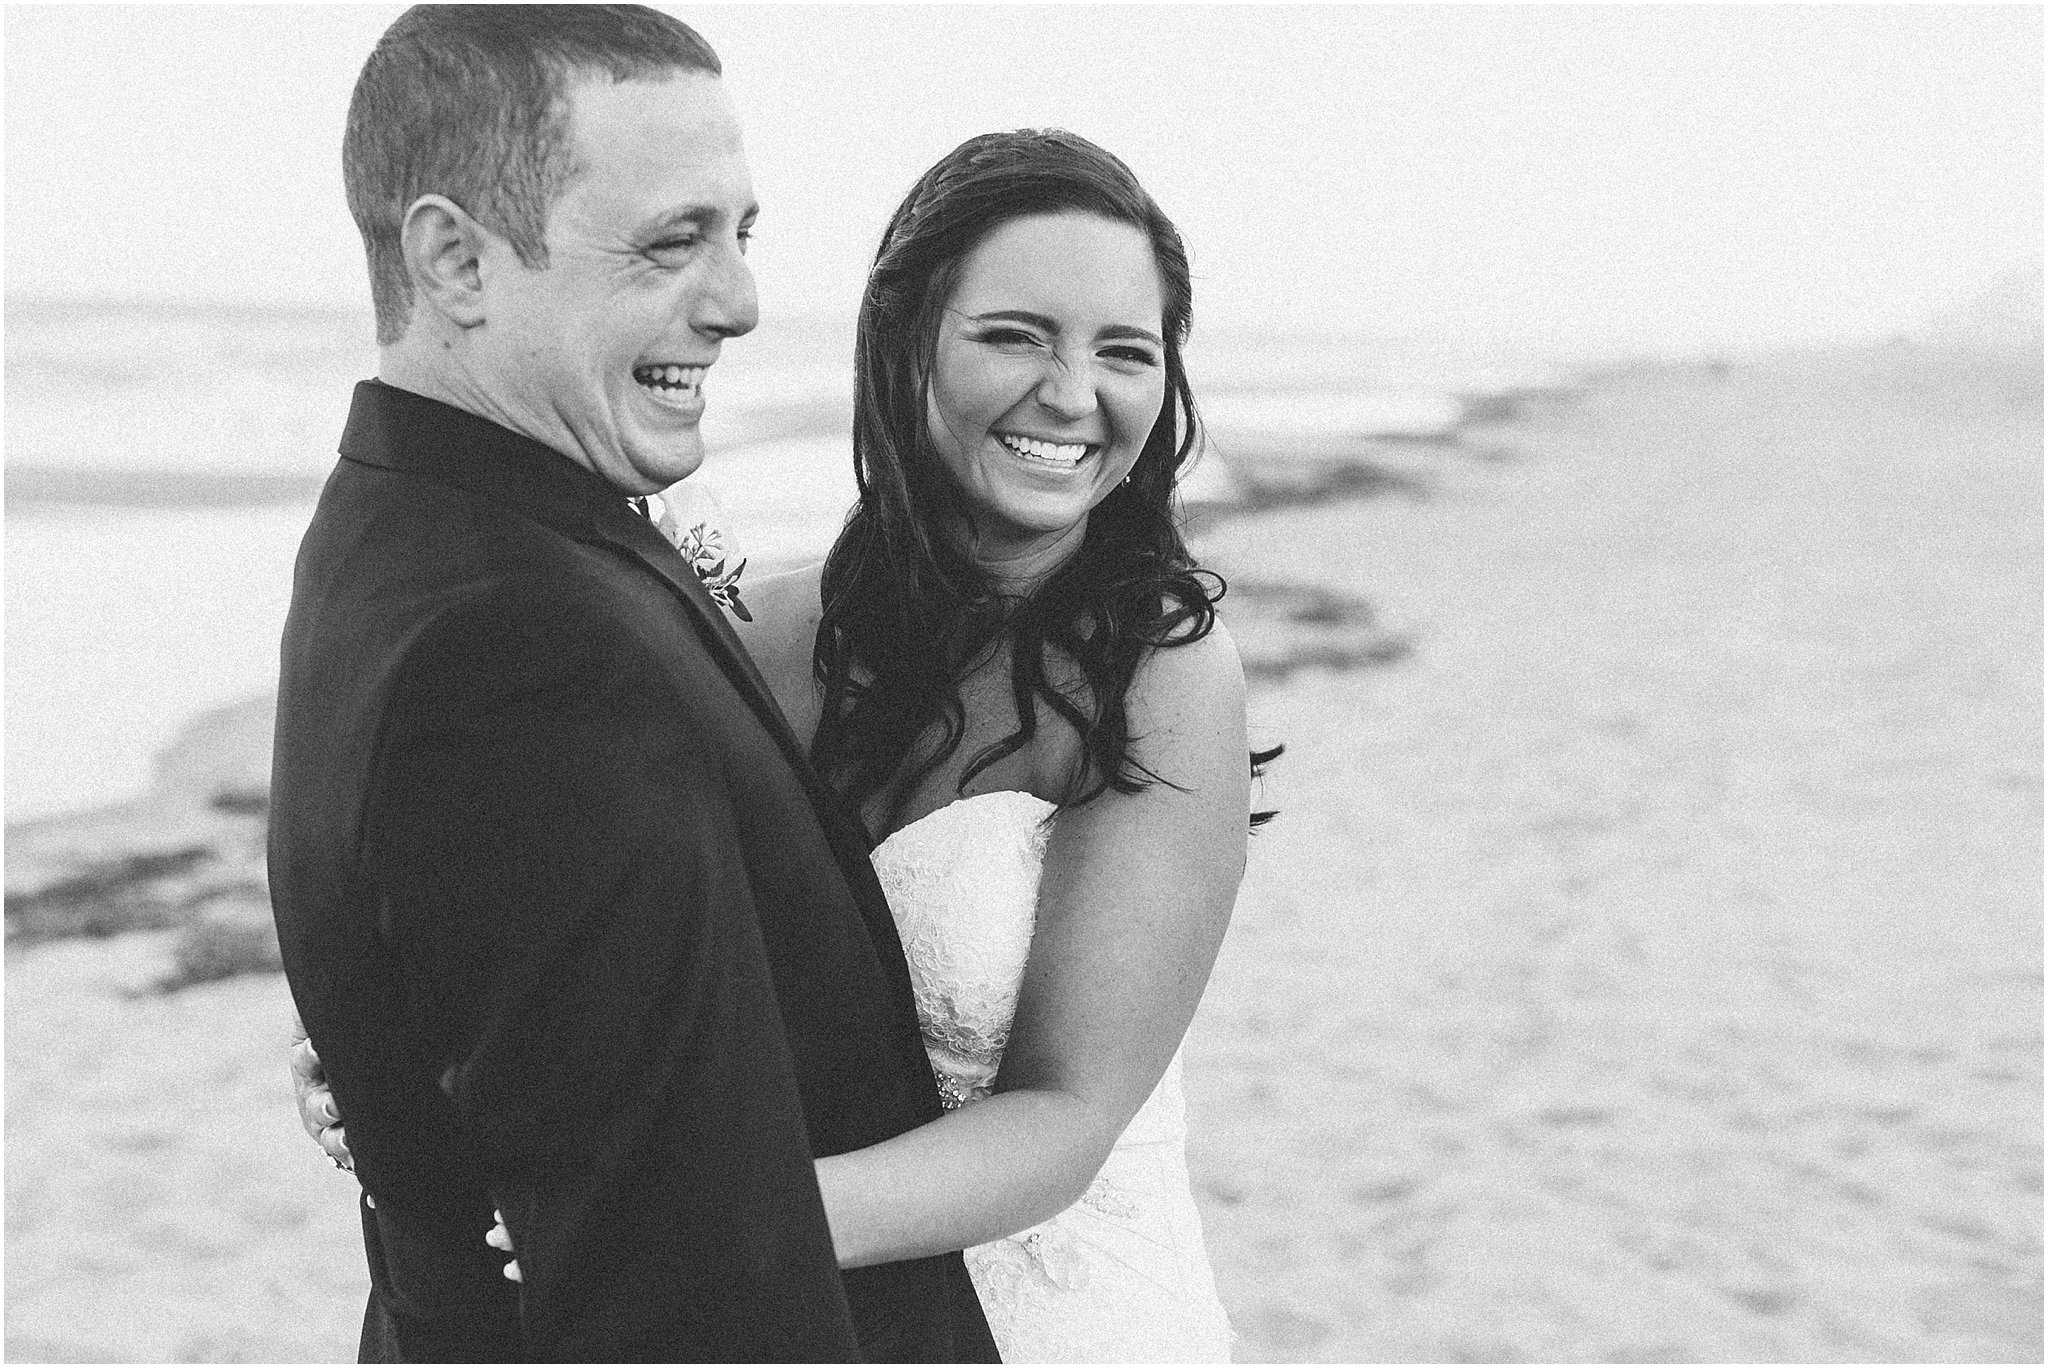 jessica_ryan_photography_wedding_hampton_roads_virginia_virginia_beach_weddings_0619